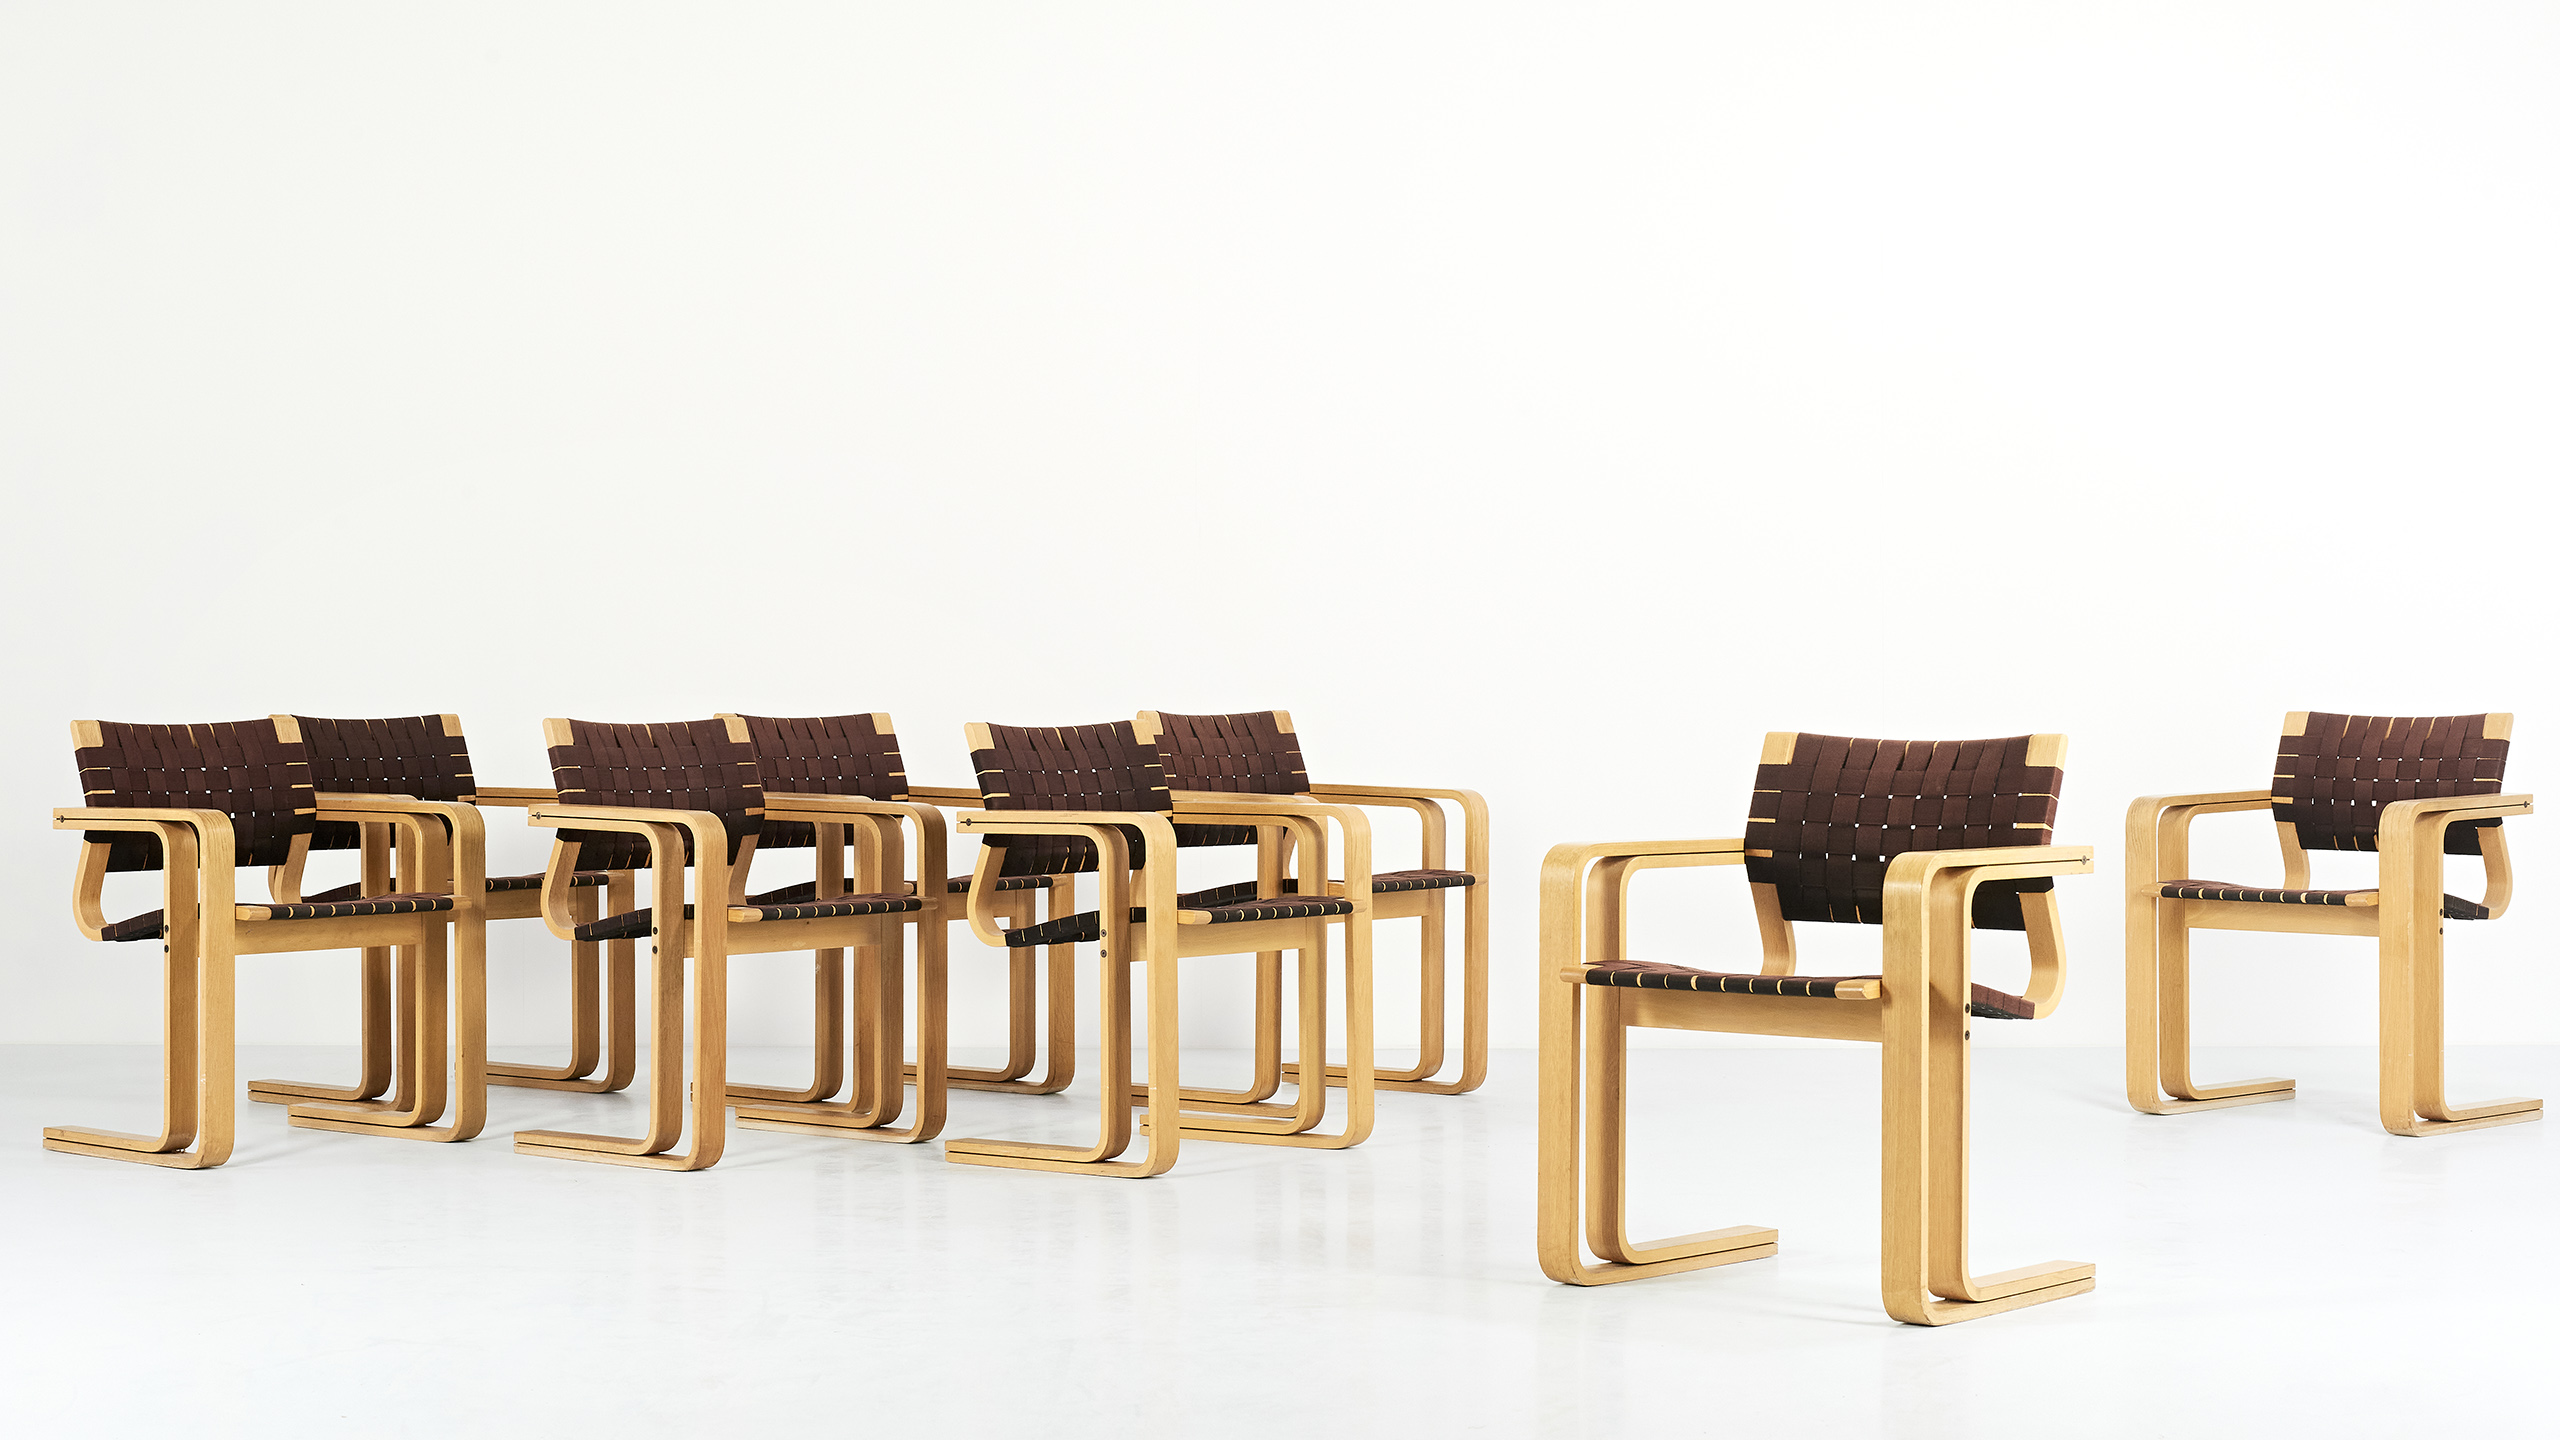 Rud Thygesen & Johnny Sørensen magnus olesen 5531 armchair chair chaise fauteuil vintage design danish danois danemark scandinave scandinavian